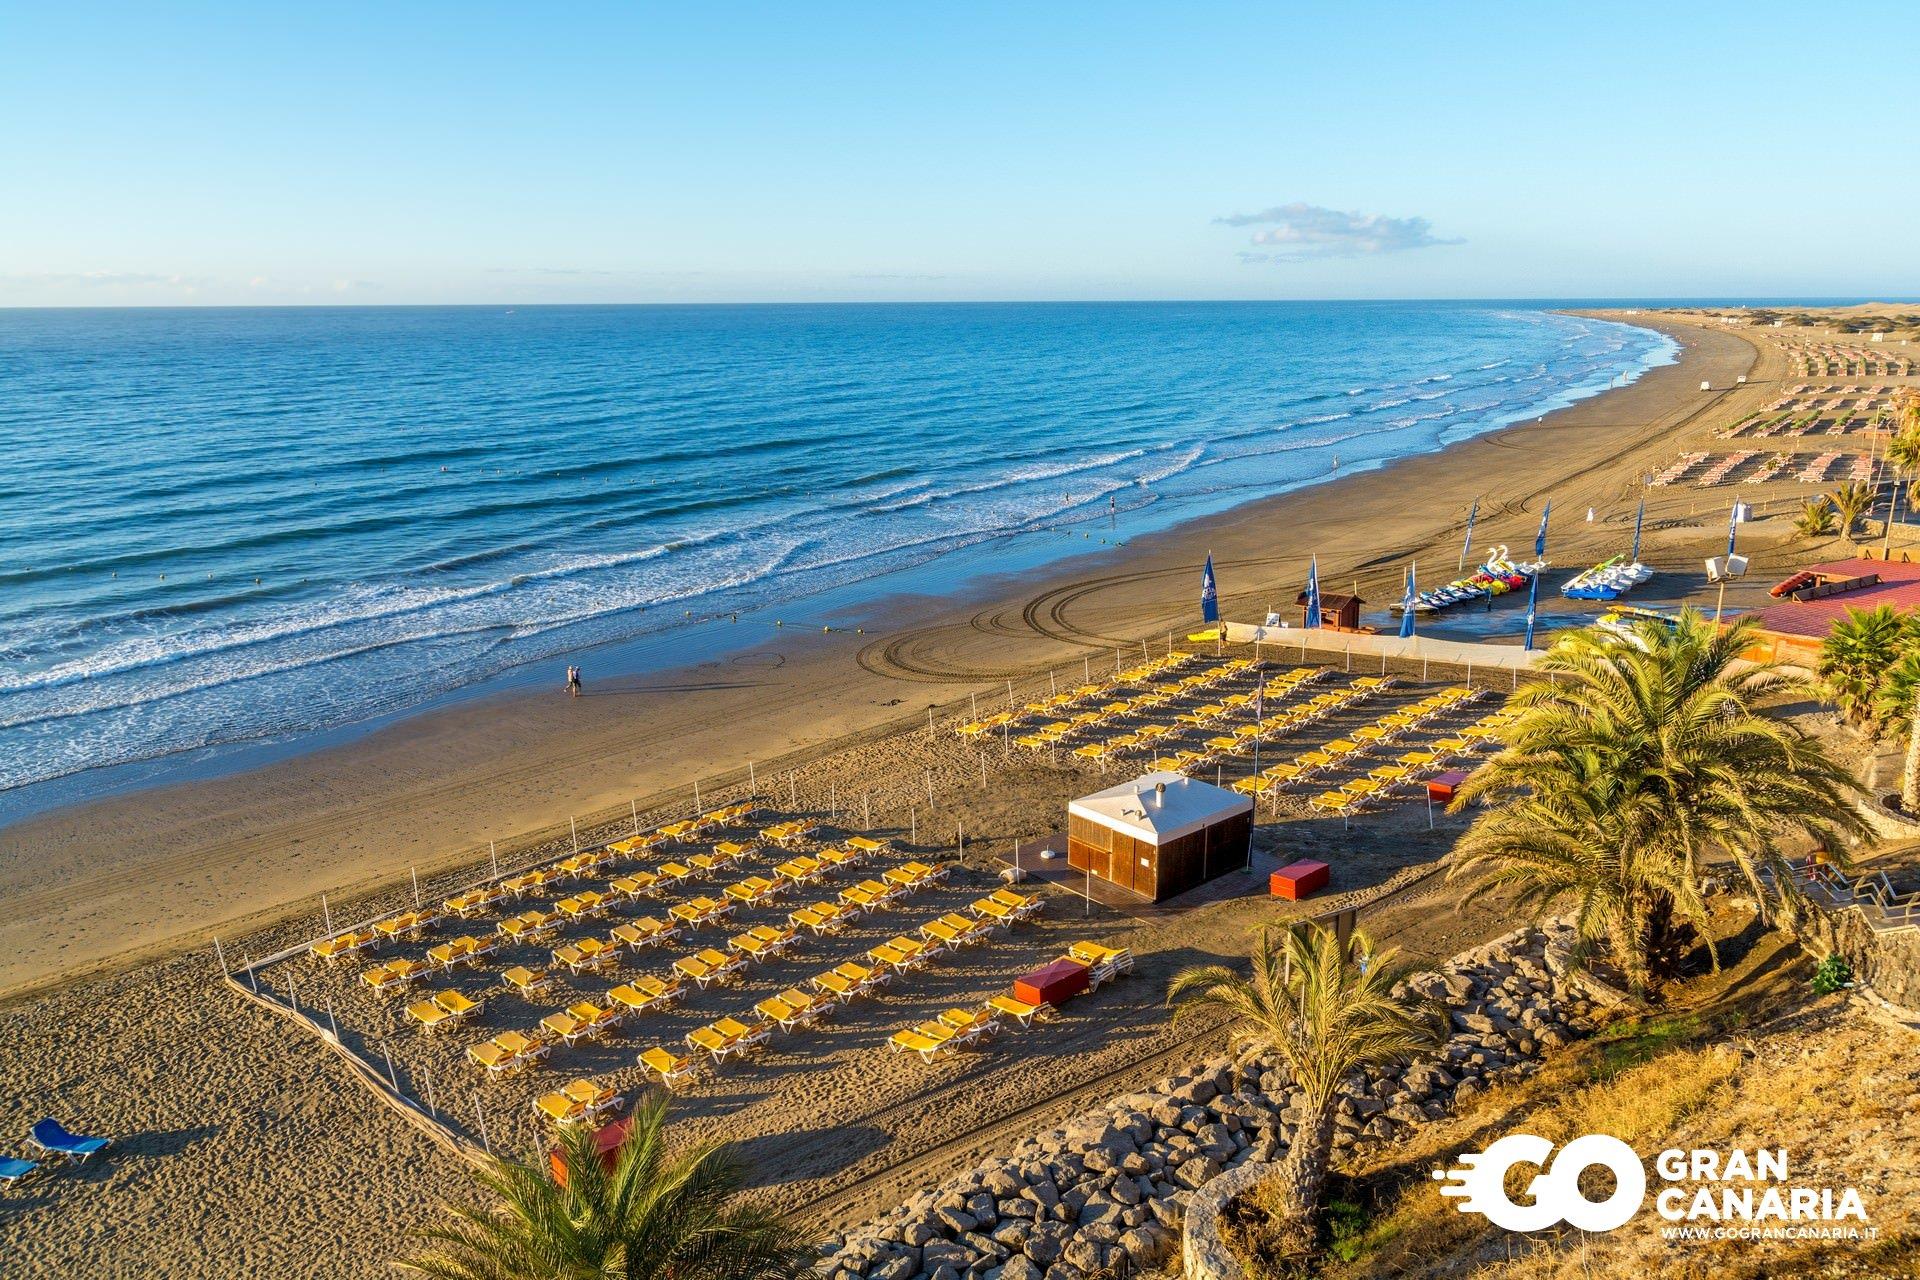 Playa del ingl s a gran canaria for Gran canaria padel indoor